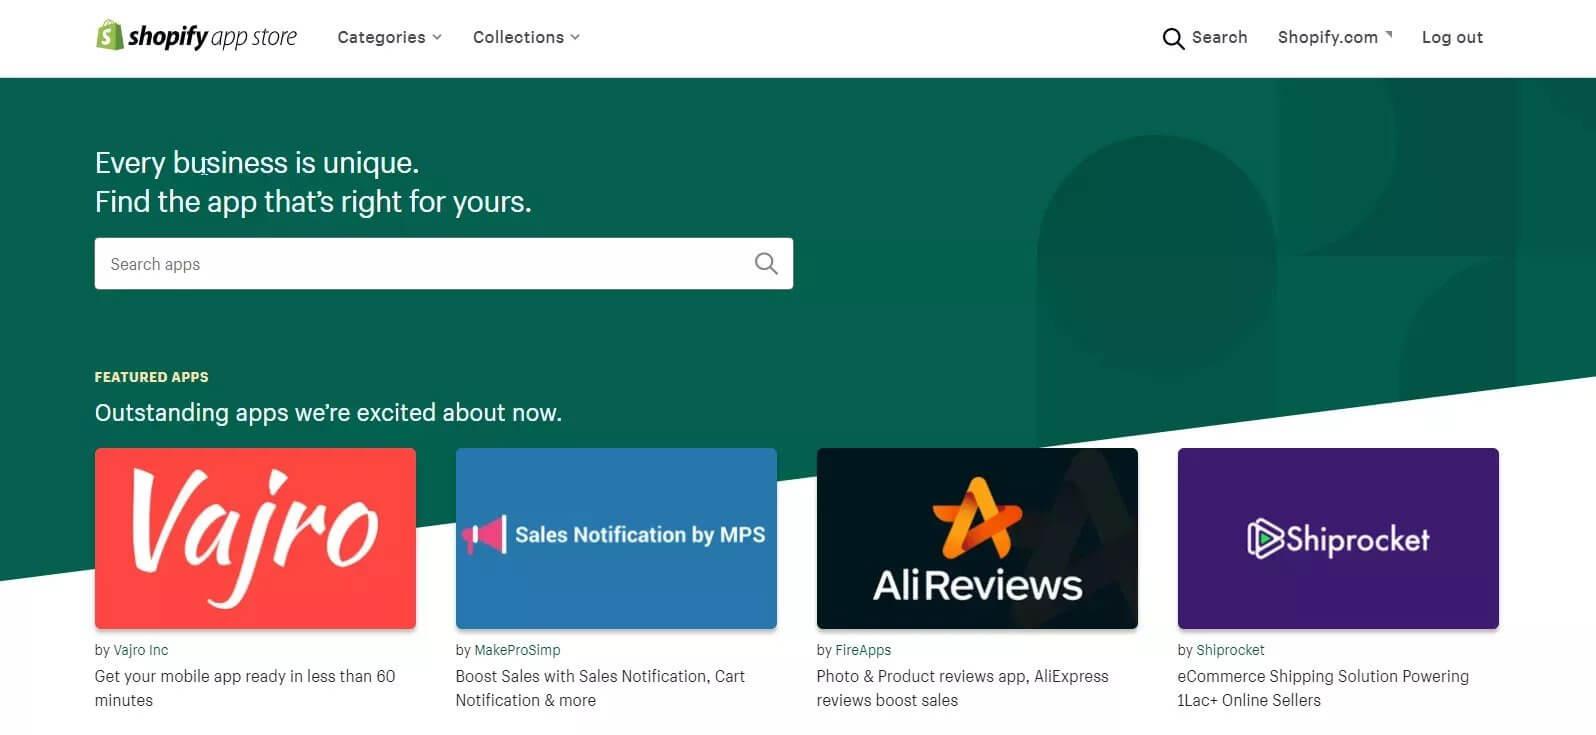 Ali Reviews In Shopify Staff picks India